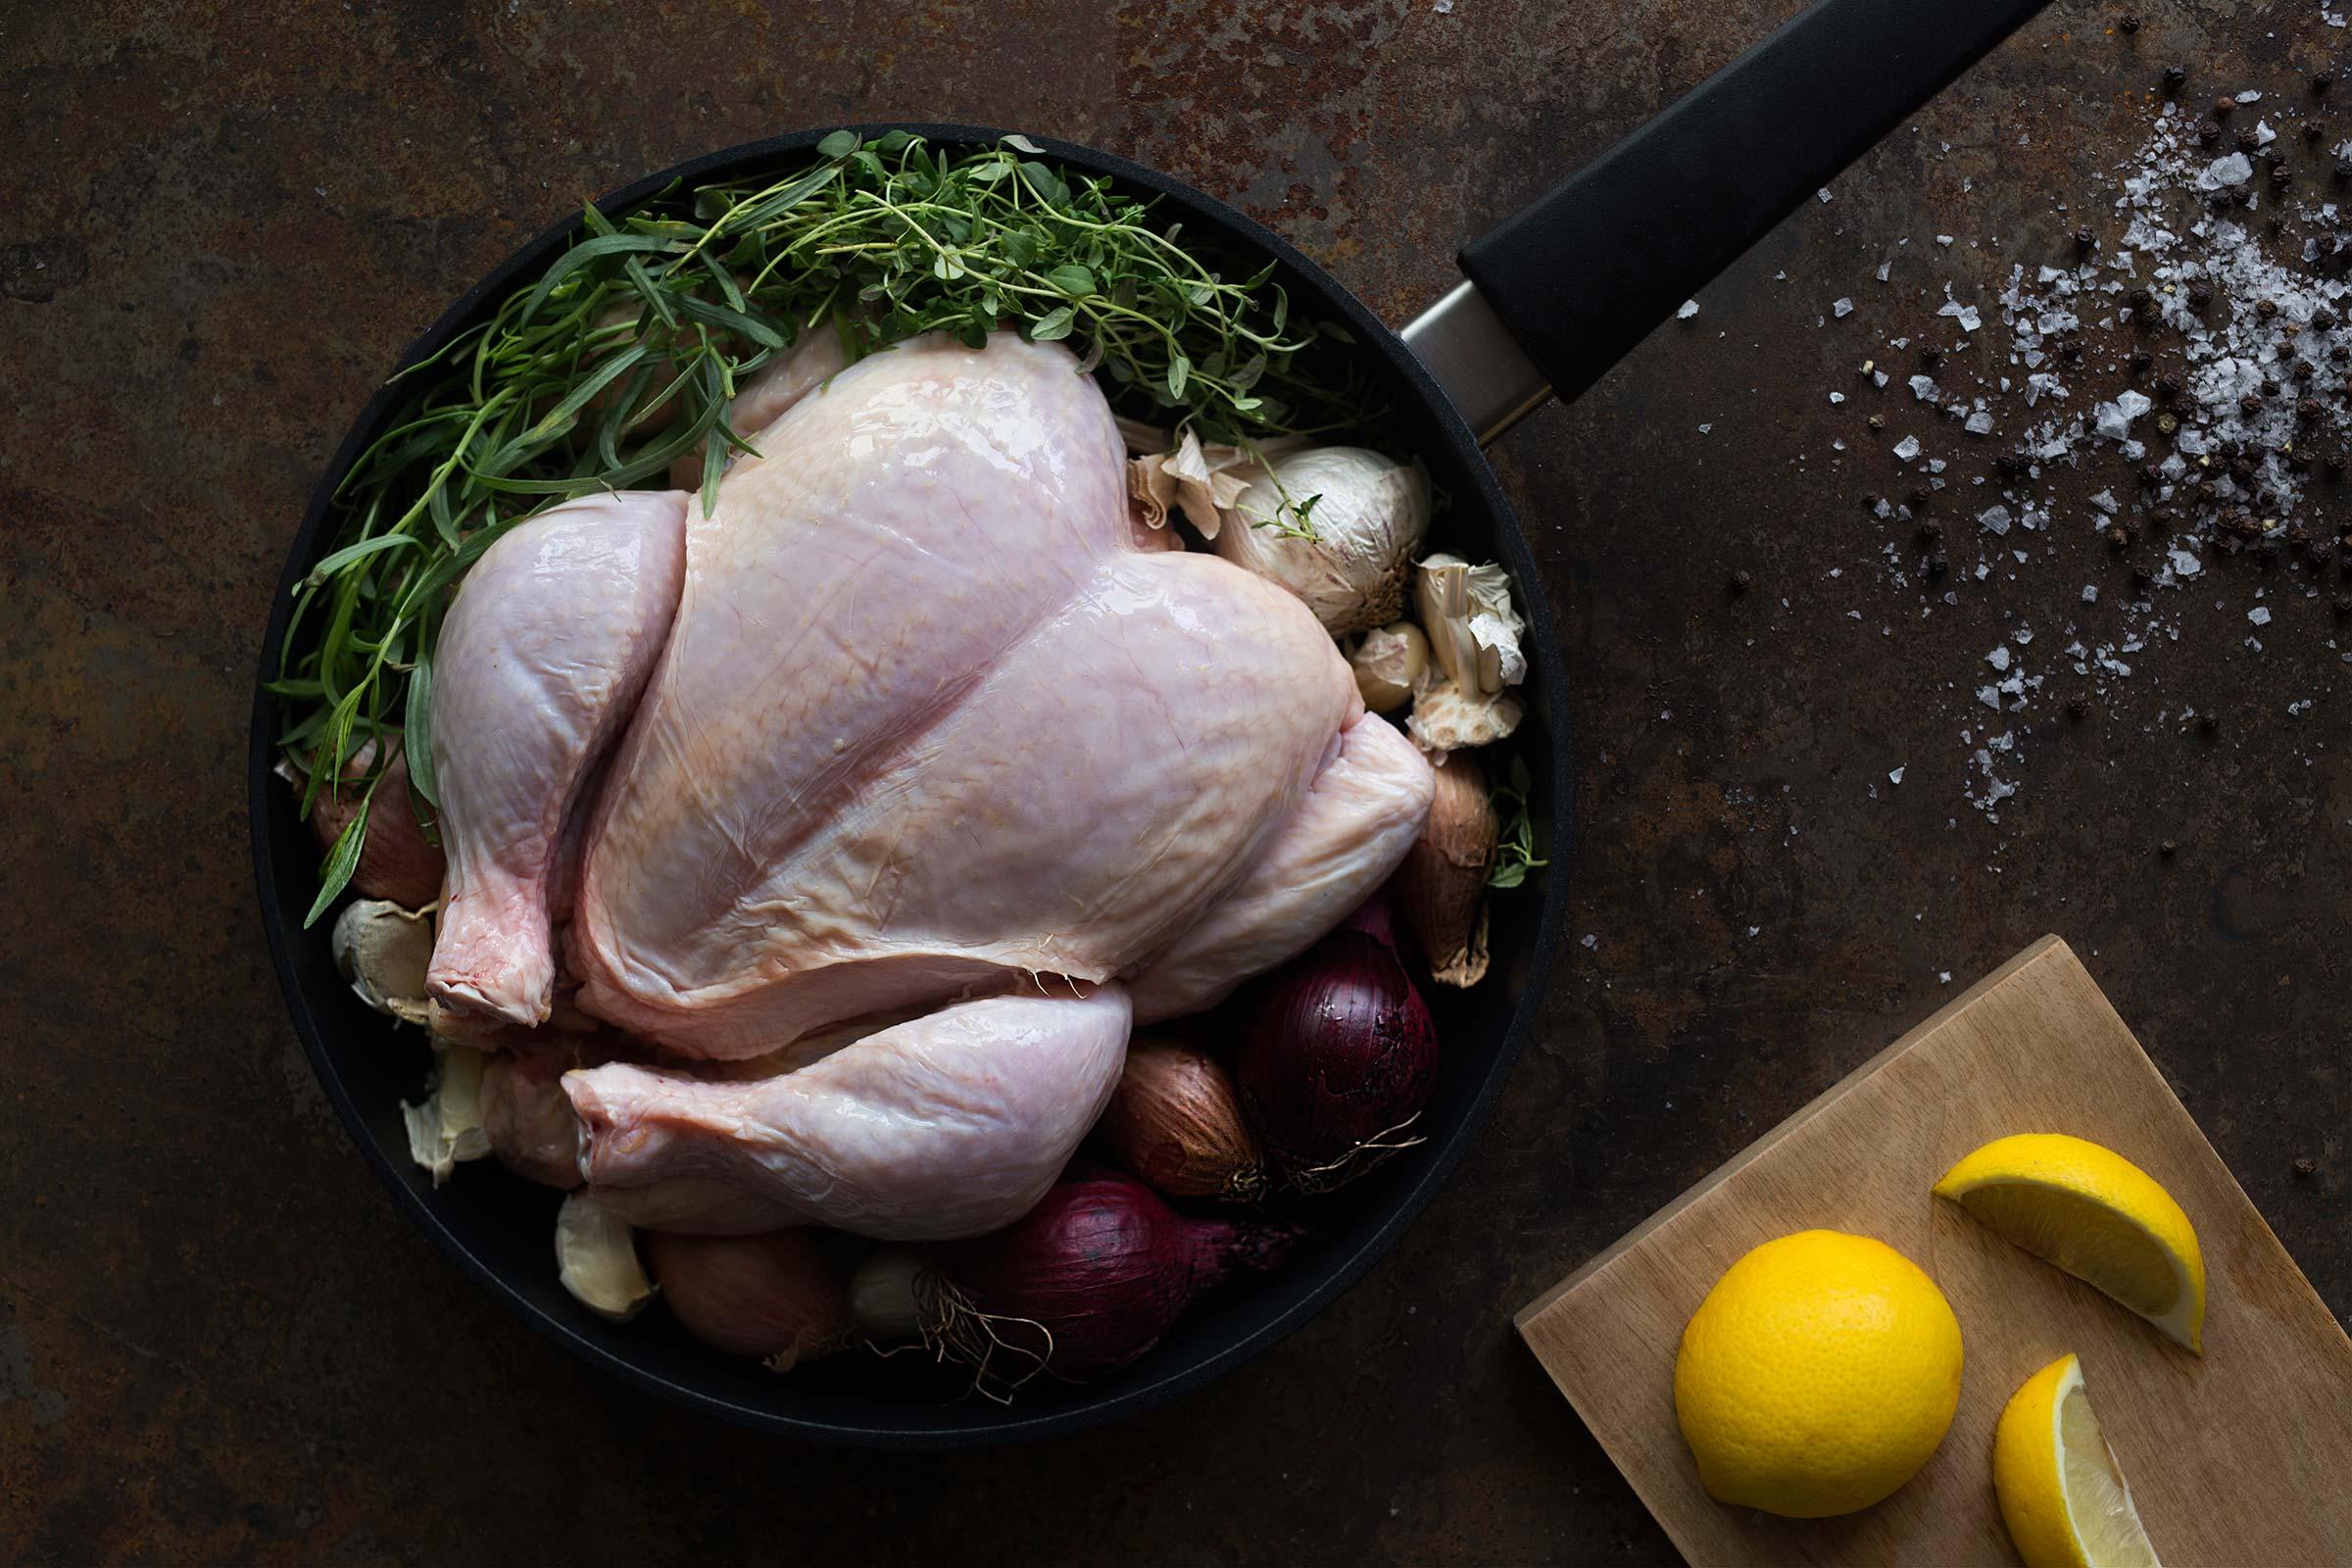 Bilde av en hel kylling